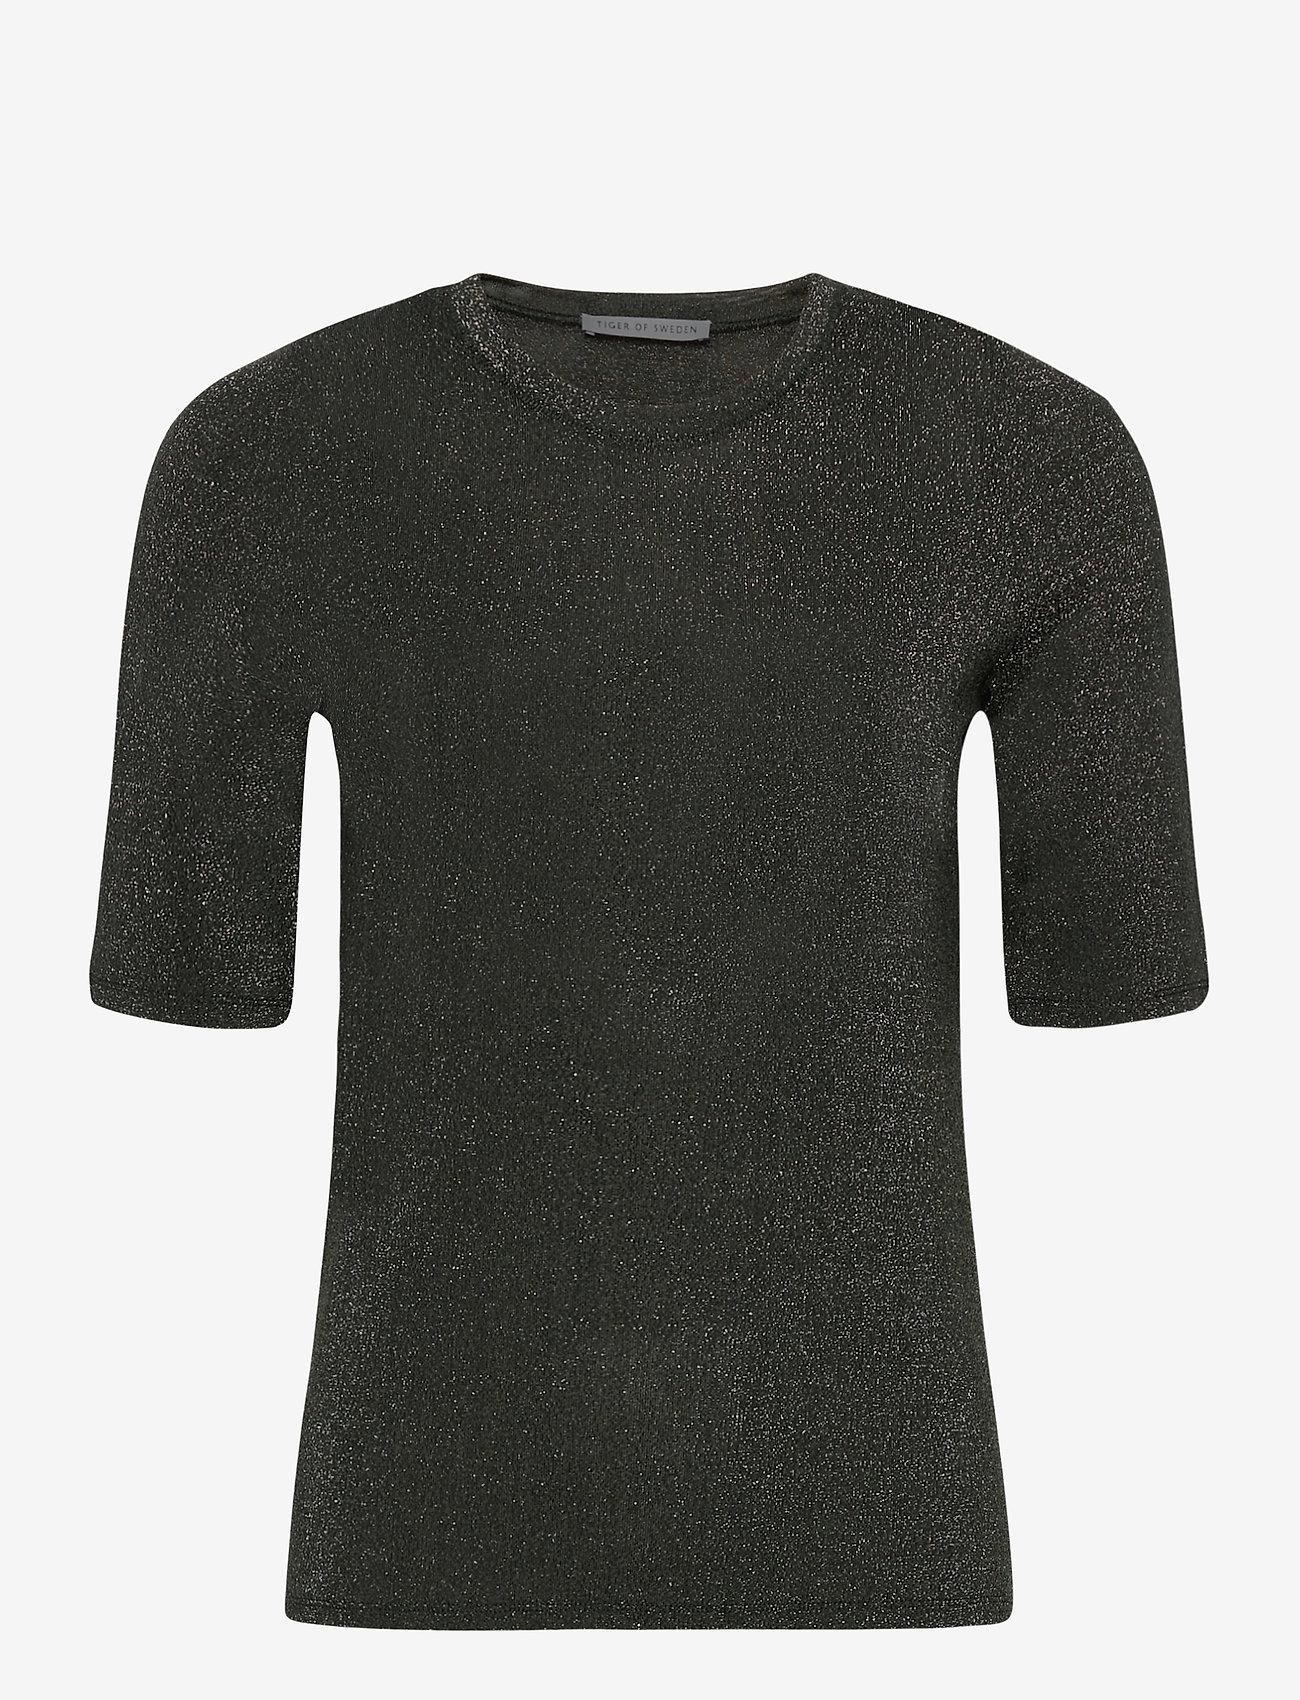 Tiger of Sweden - UBA - t-shirts - black green - 0